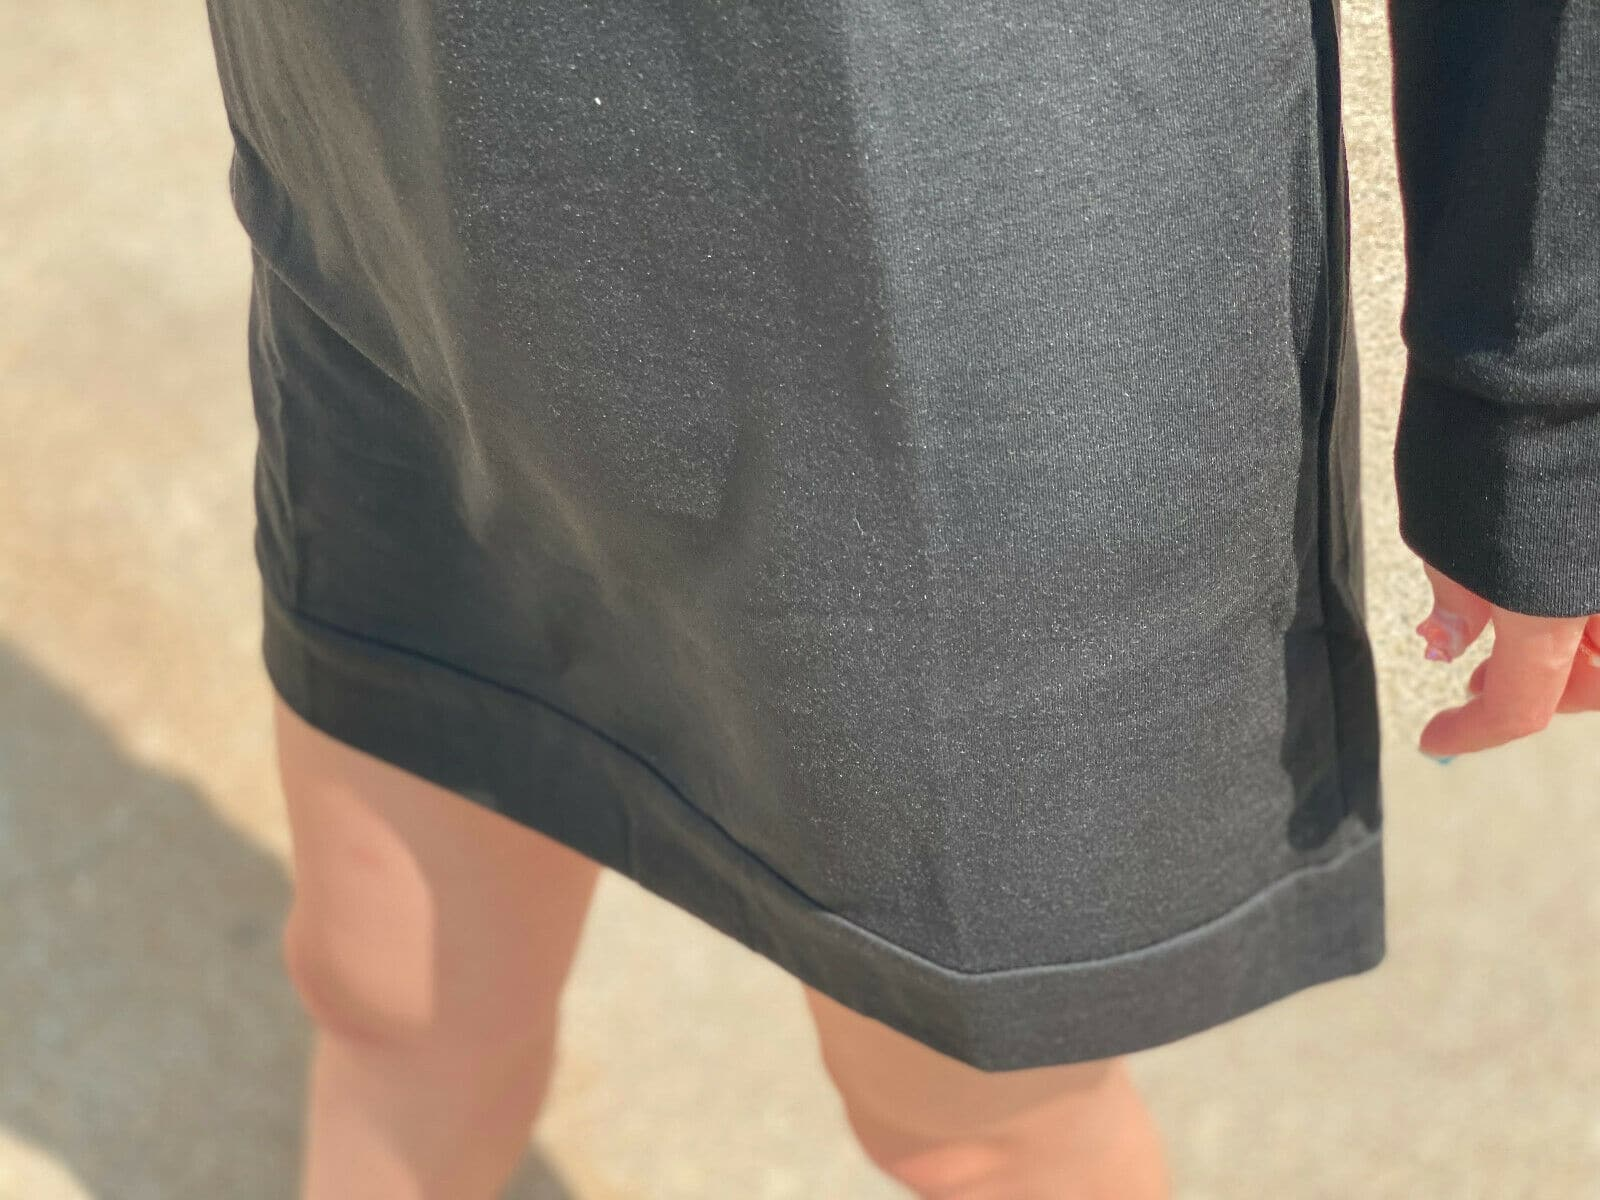 Women Oversize Sweatshirt Mini Dress Sweater Casual Loose Top Baggy Shirt